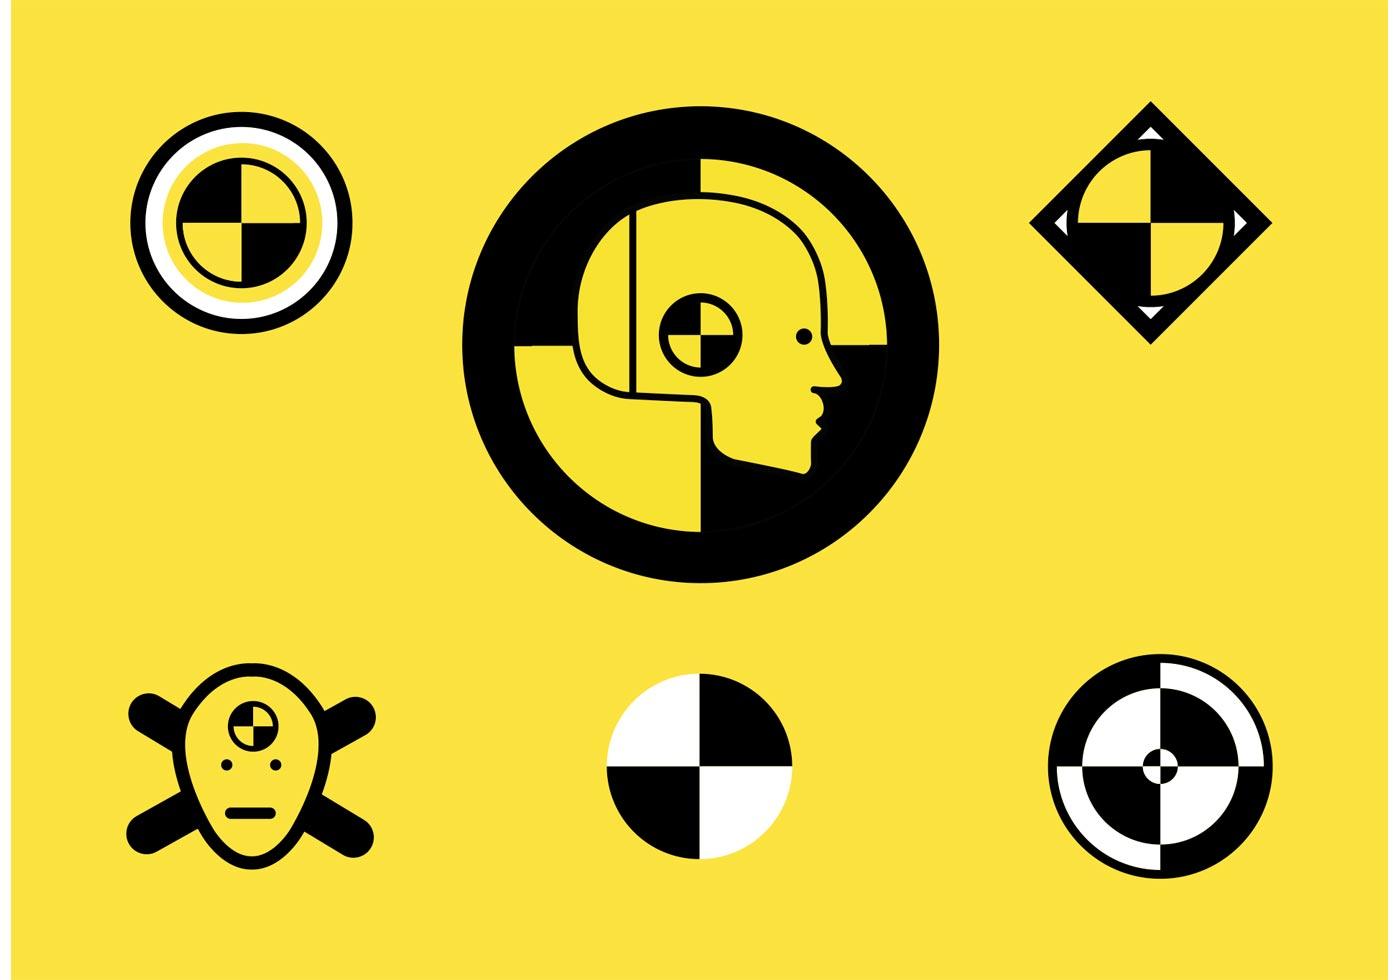 Crash Dummy Logos Vector Free  Download Free Vector Art Stock Graphics  Images